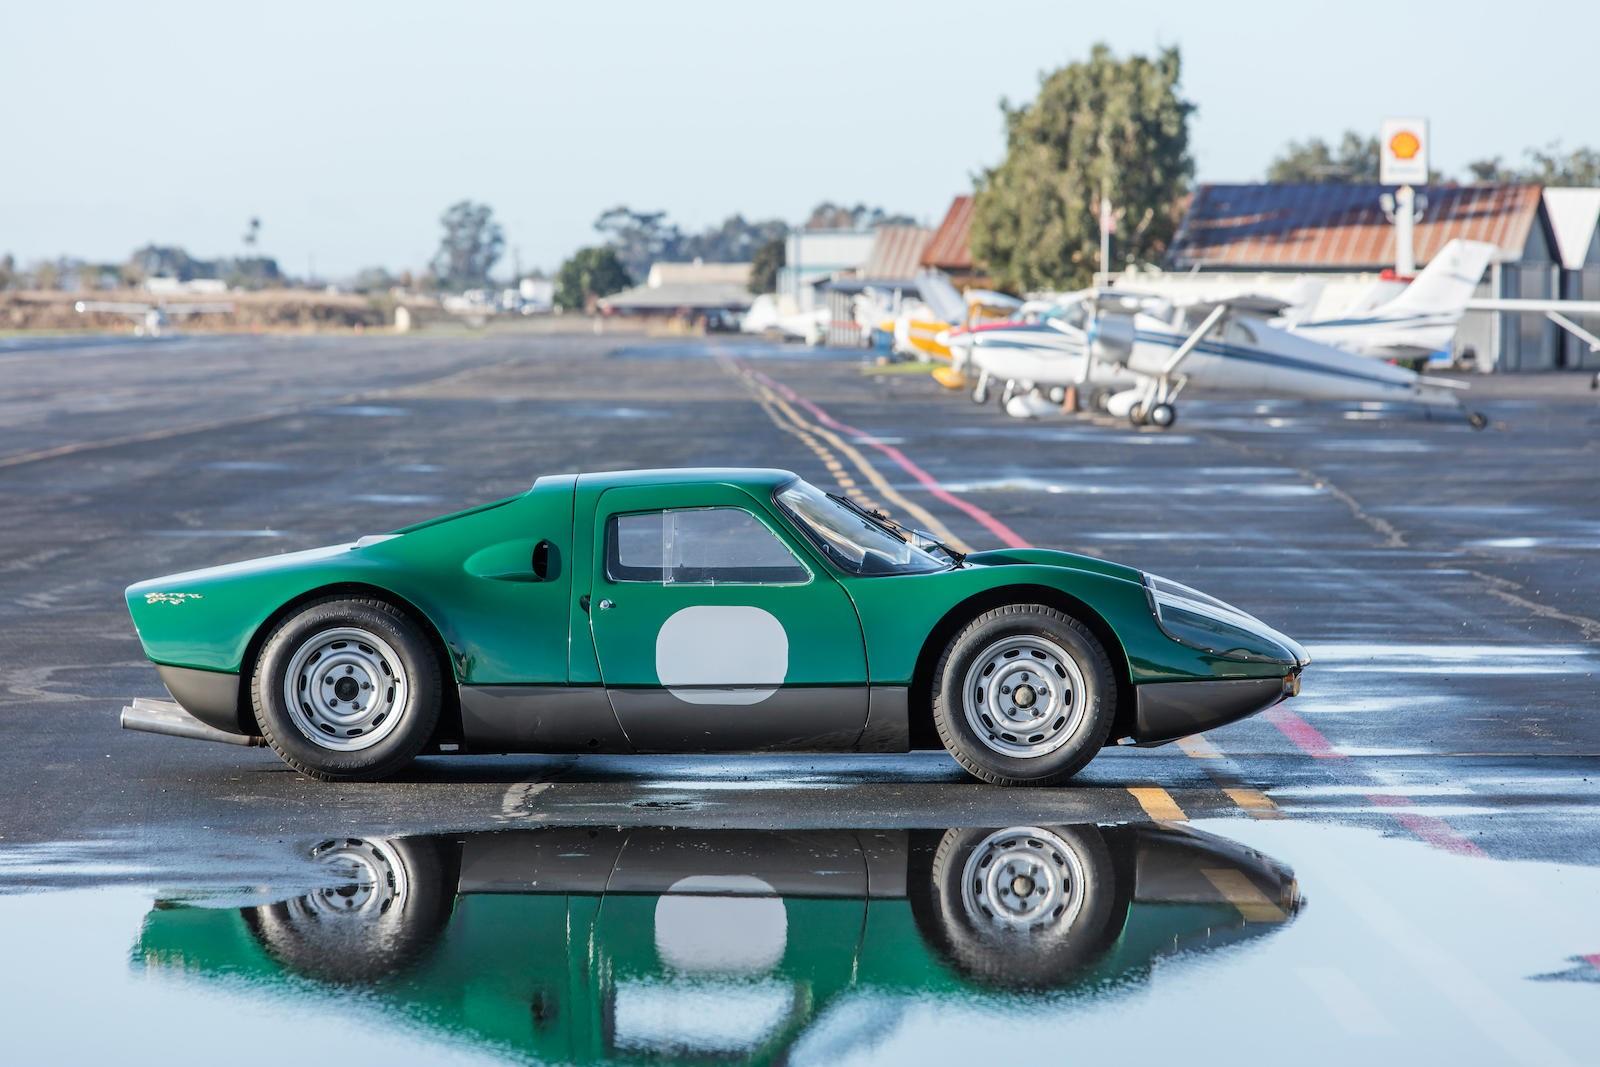 1964 Porsche 904 GTS profile